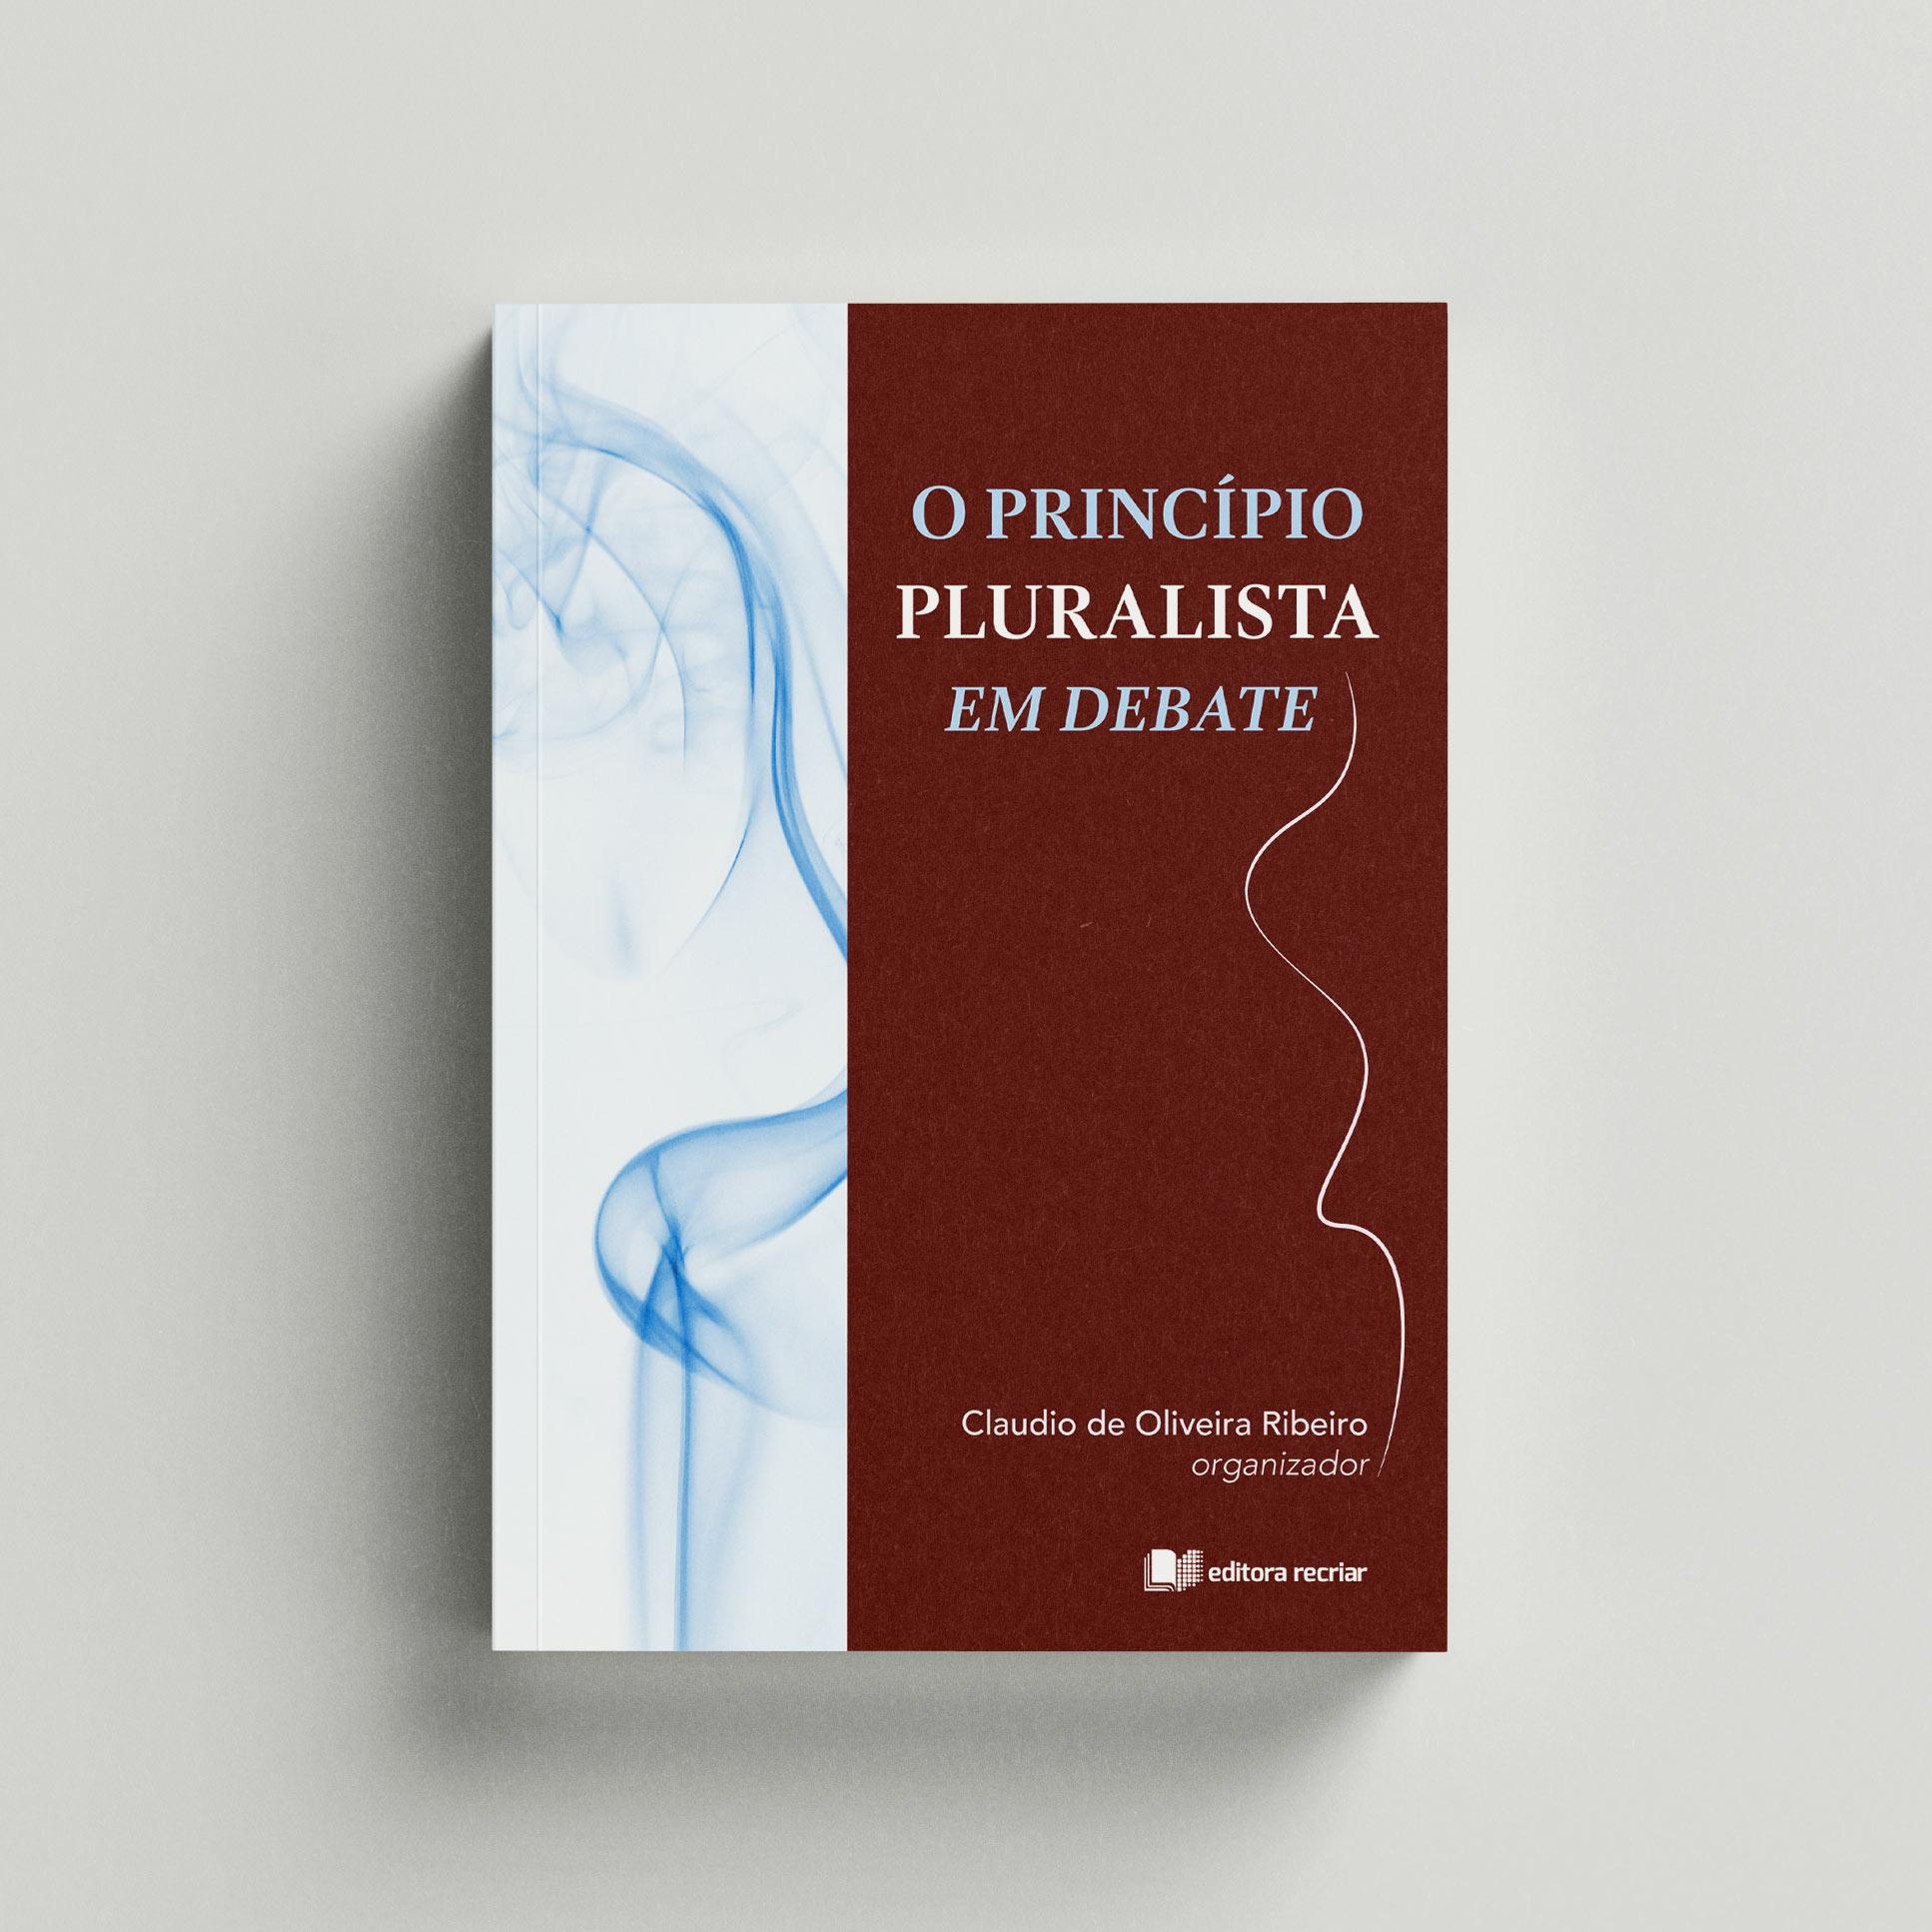 O princípio pluralista em debate